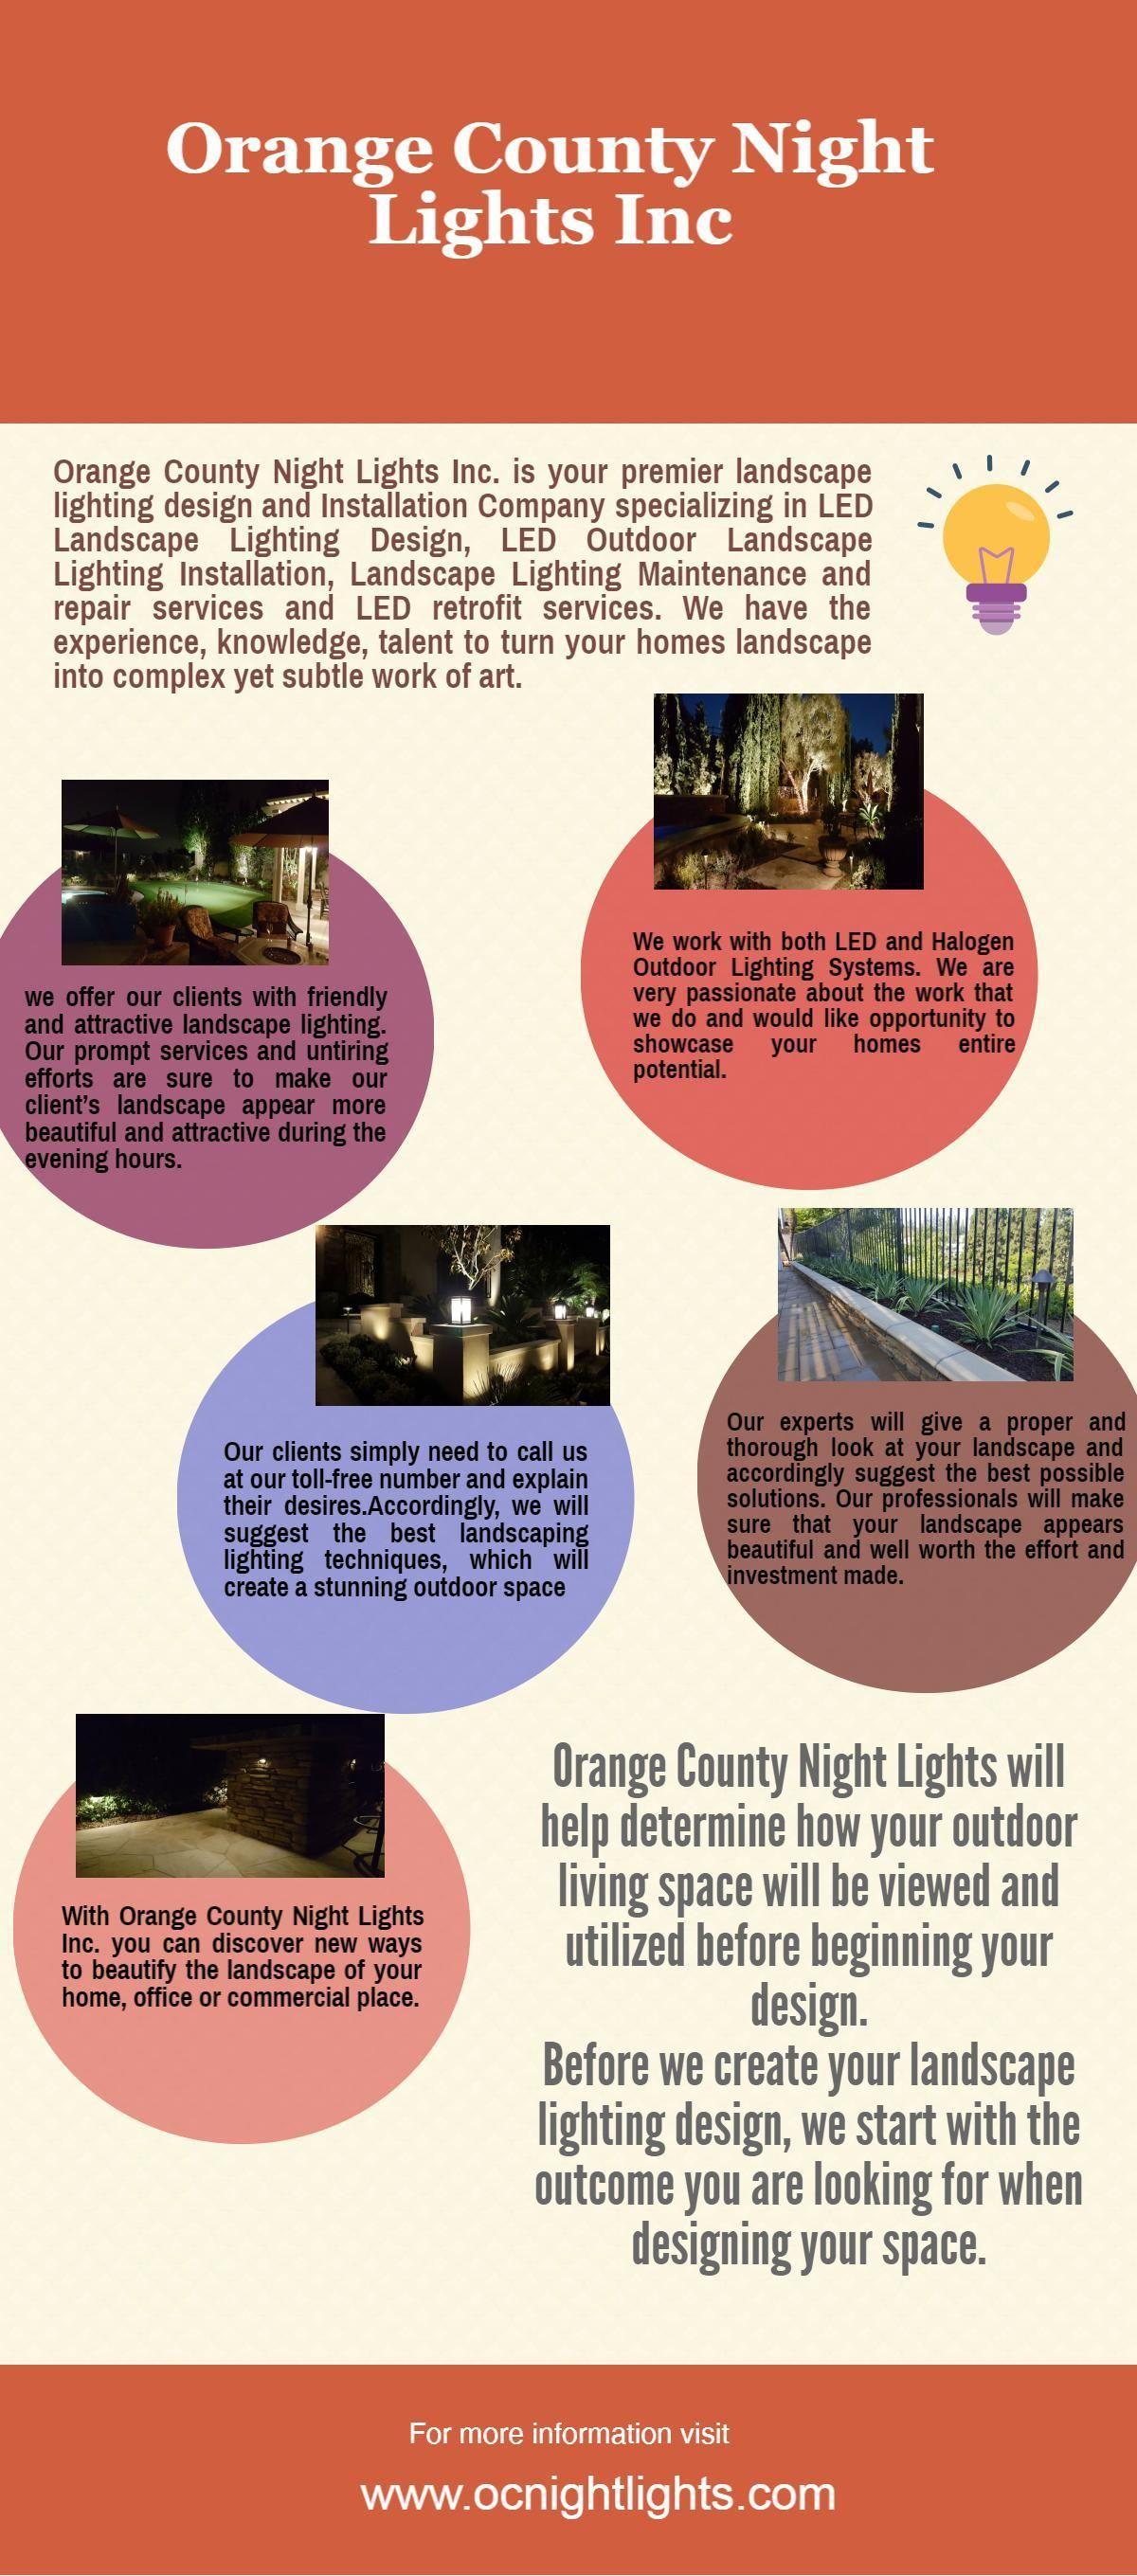 Orange County Night Lights Inc